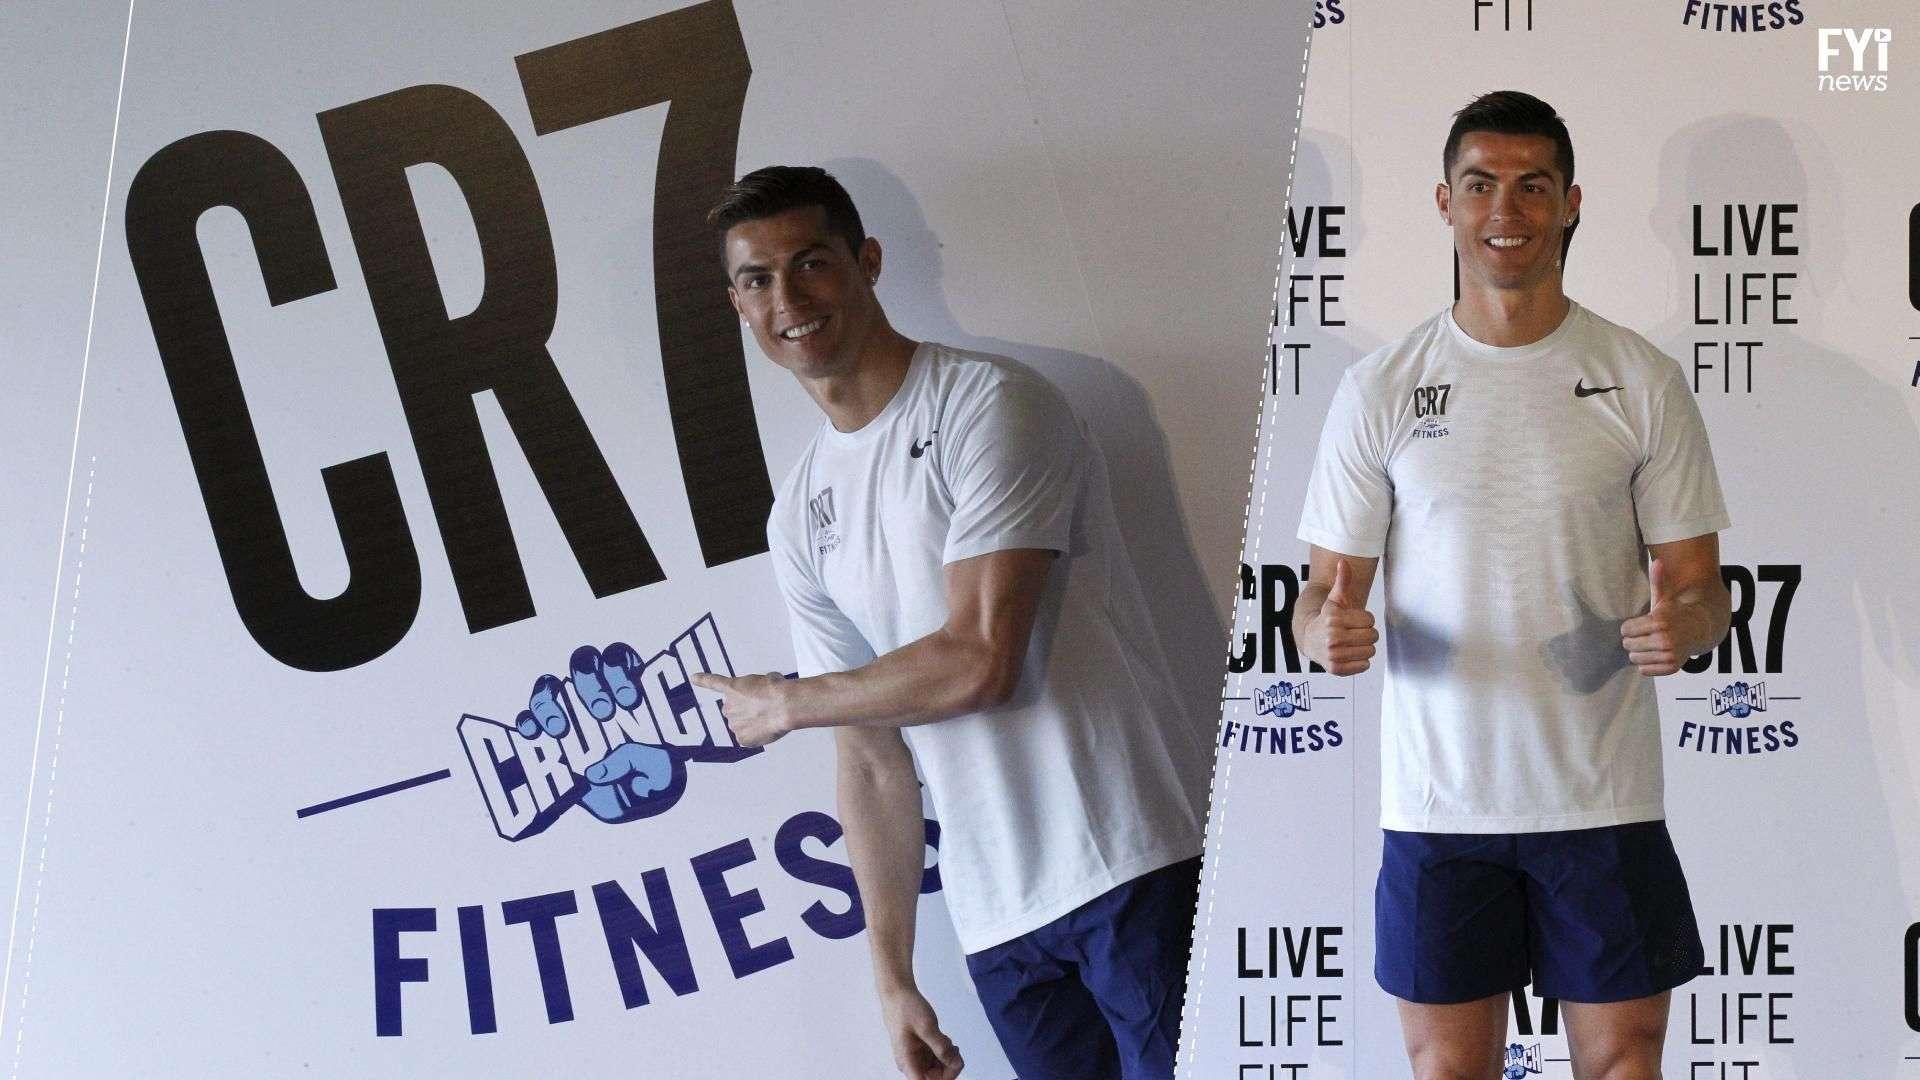 Cristiano Ronaldo está preparado para entrenar contigo